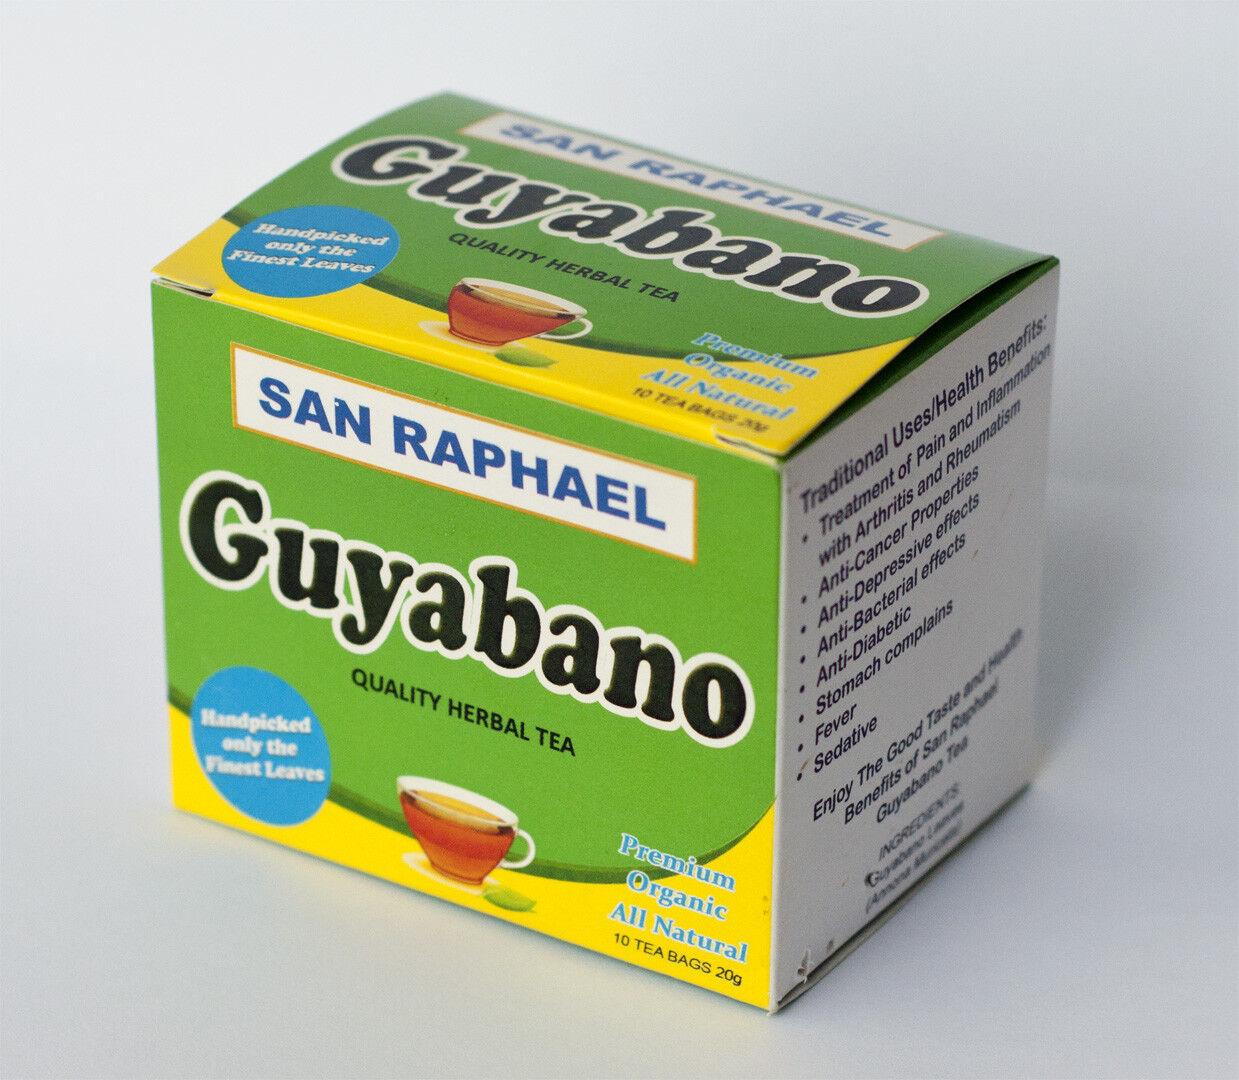 Soursop Graviola Guanabana Corossol Organisch Tee